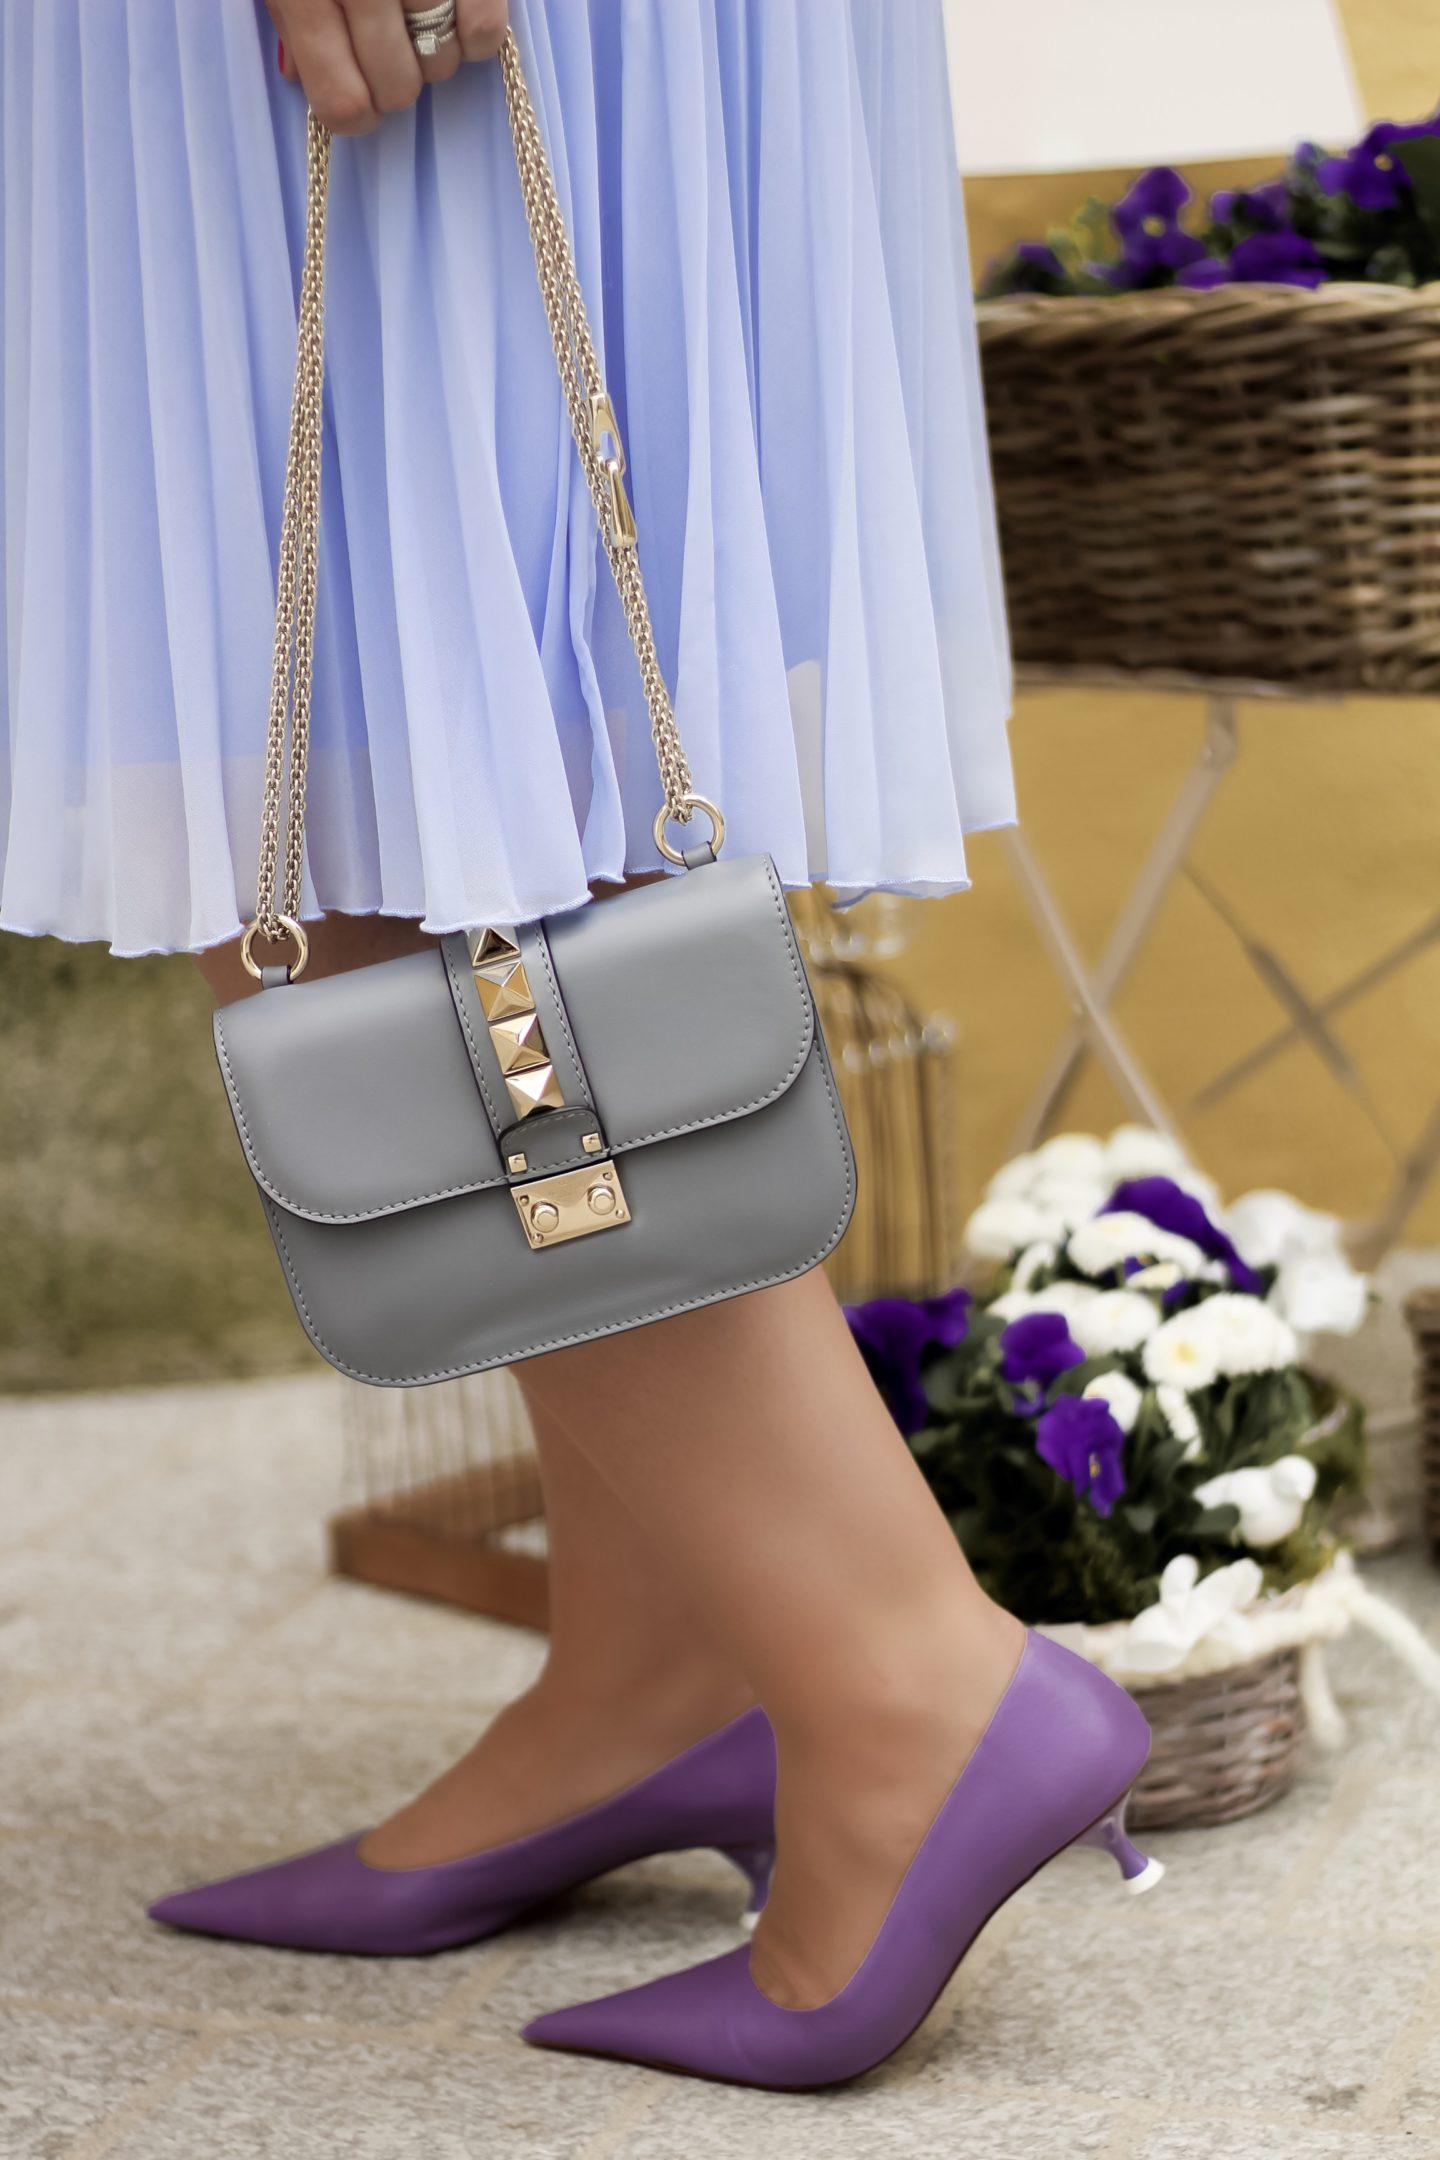 Miss-Suzie-Loves-Sommer-Sorbet-Outfit-Pastell-Plisseerock-kombinieren-Flieder-Susanne-Heidebach-Valentino-Rockstud-Kitzbuehel-Fashionblogger-Curvyblogger